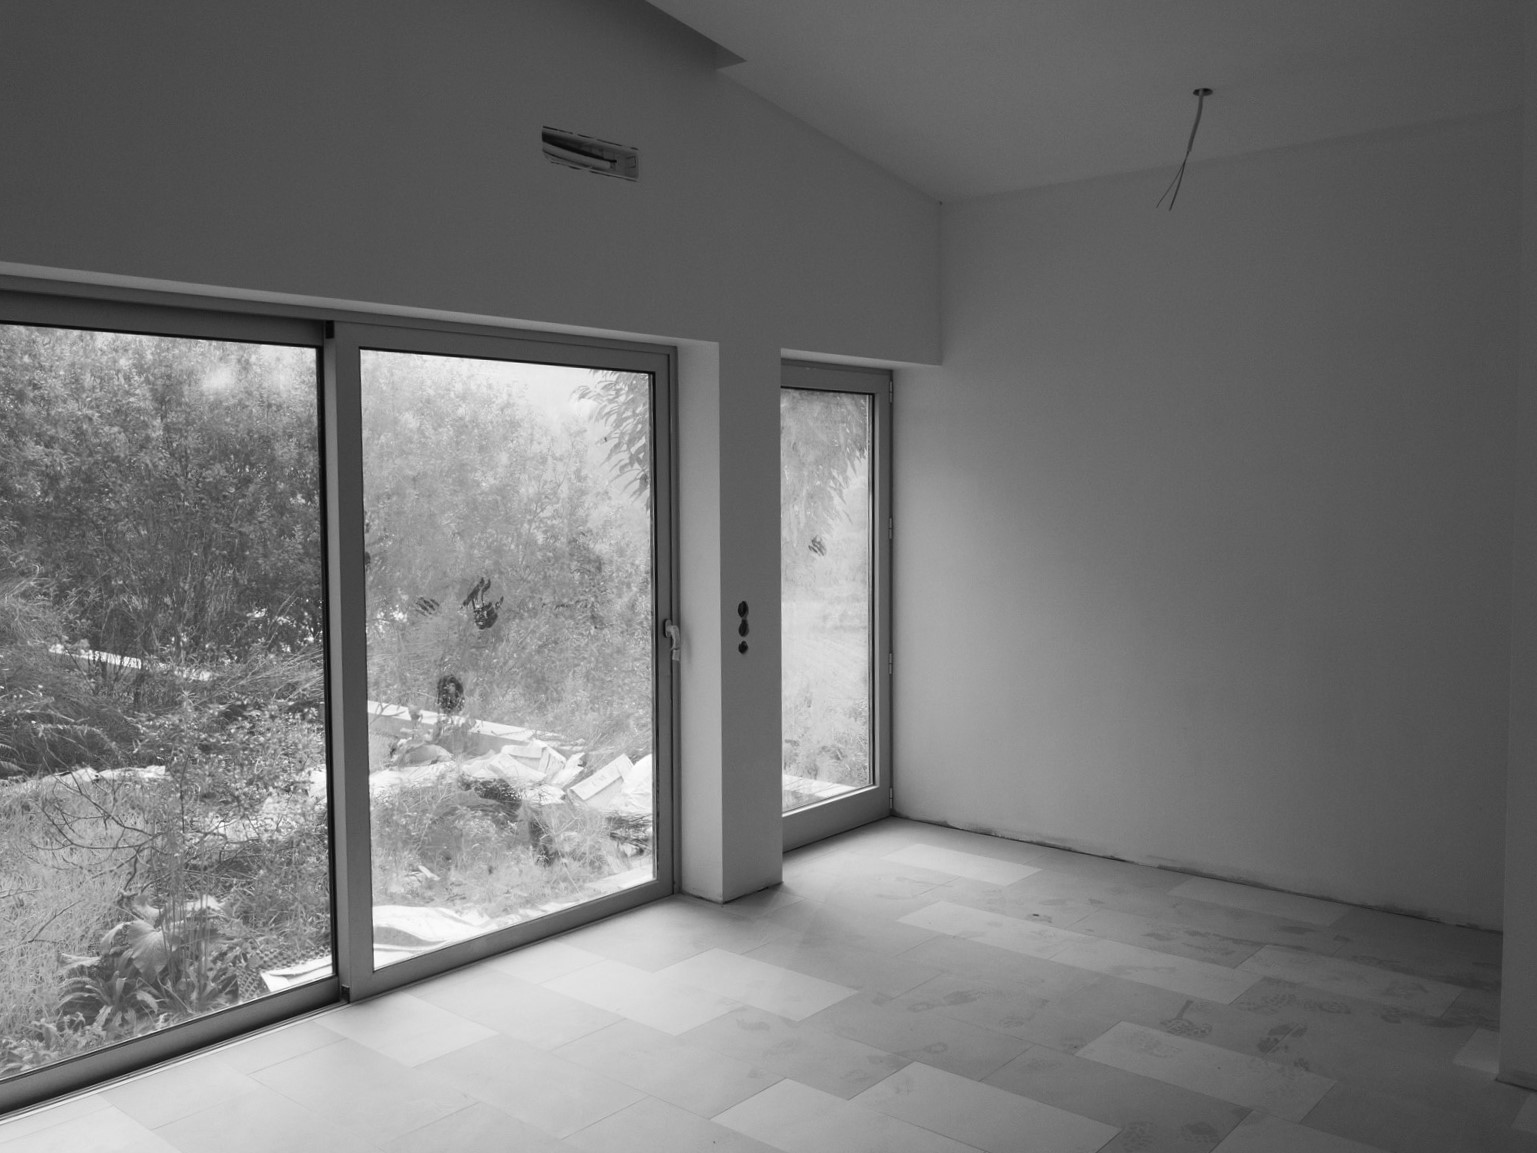 Moradia S+N - arquitectura - EVA evolutionary architecture - arquitectos porto - oliveira de azemeis (4).jpg